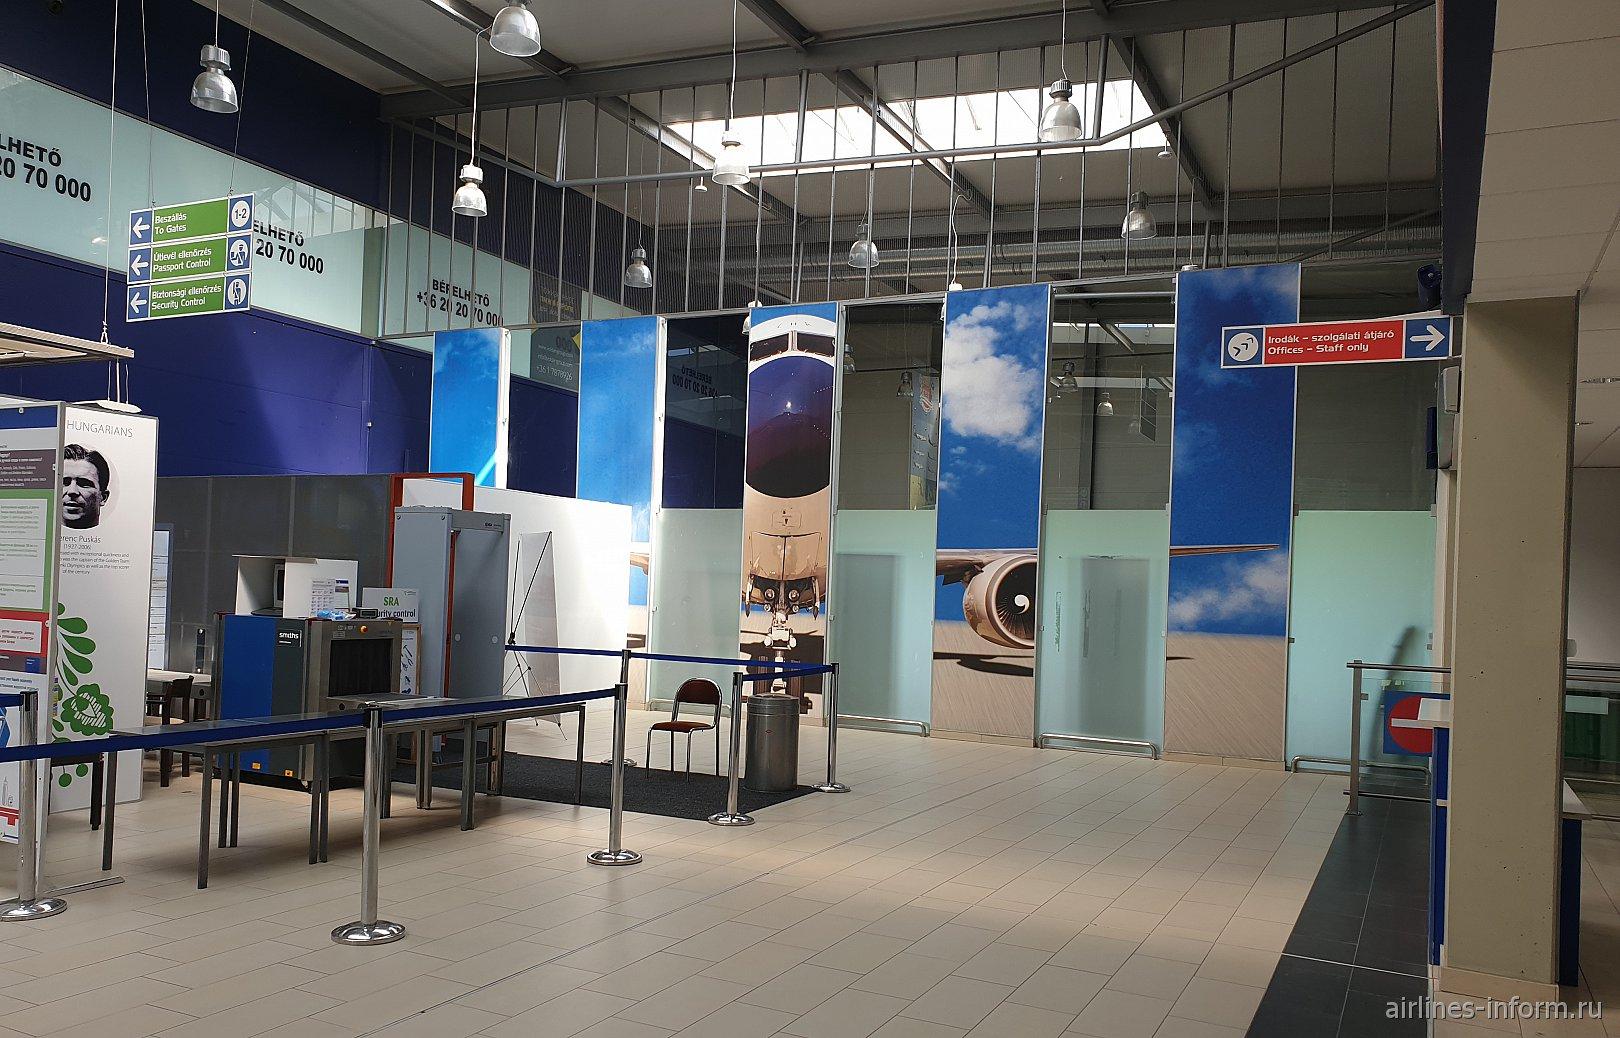 В аэровокзале аэропорта Хевиз-Балатон